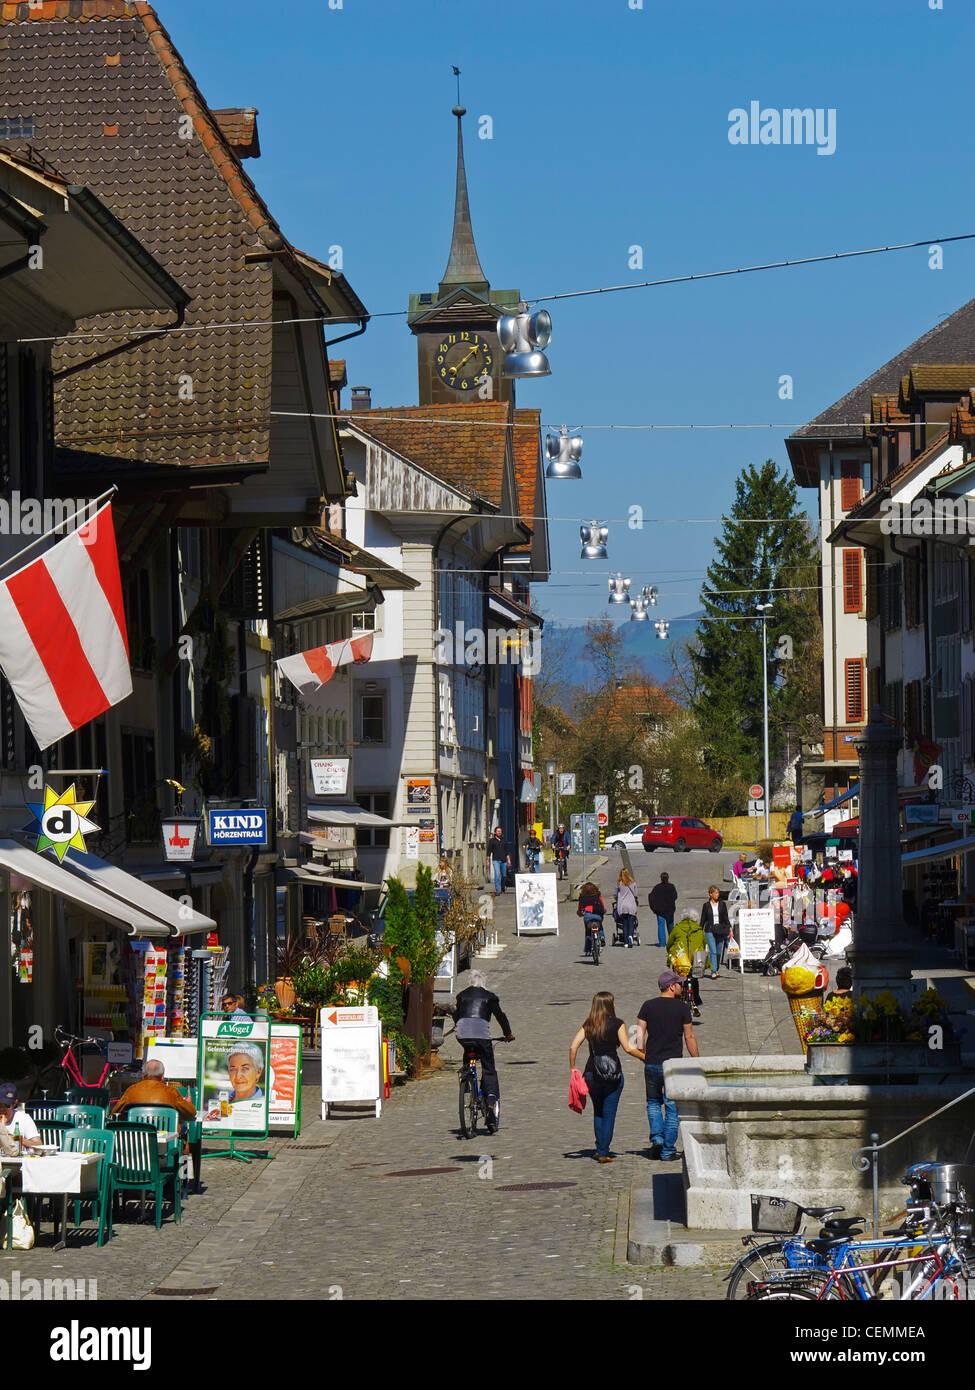 The historic city center of Zofingen, Argovia, Switzerland. - Stock Image